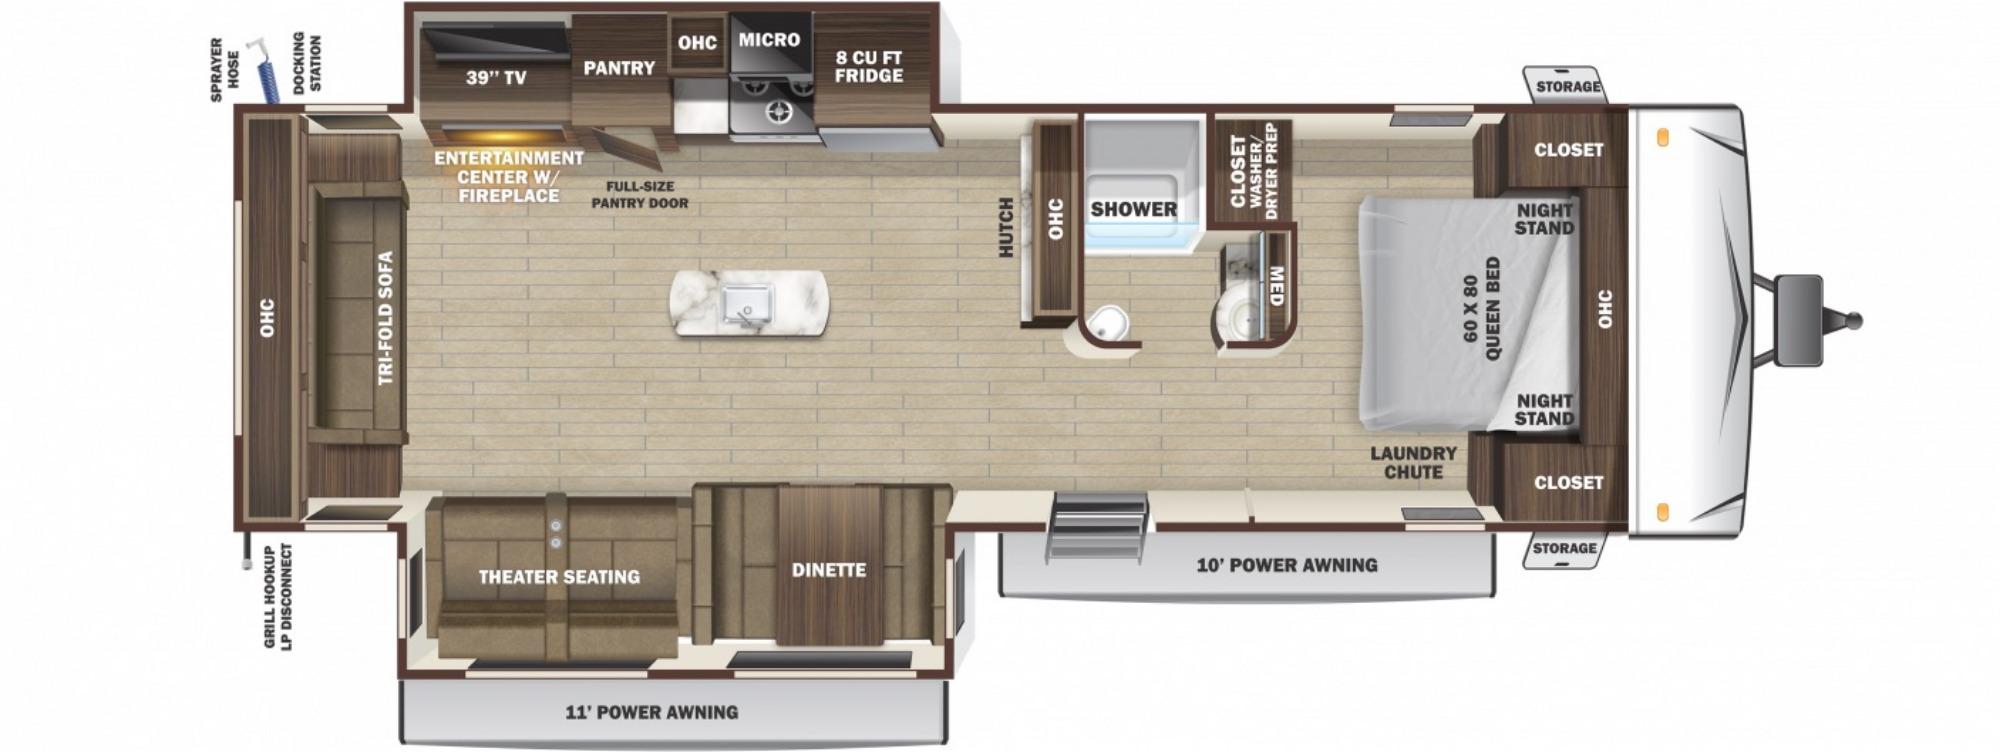 View Floor Plan for 2021 HIGHLAND RIDGE LIGHT 290RLS